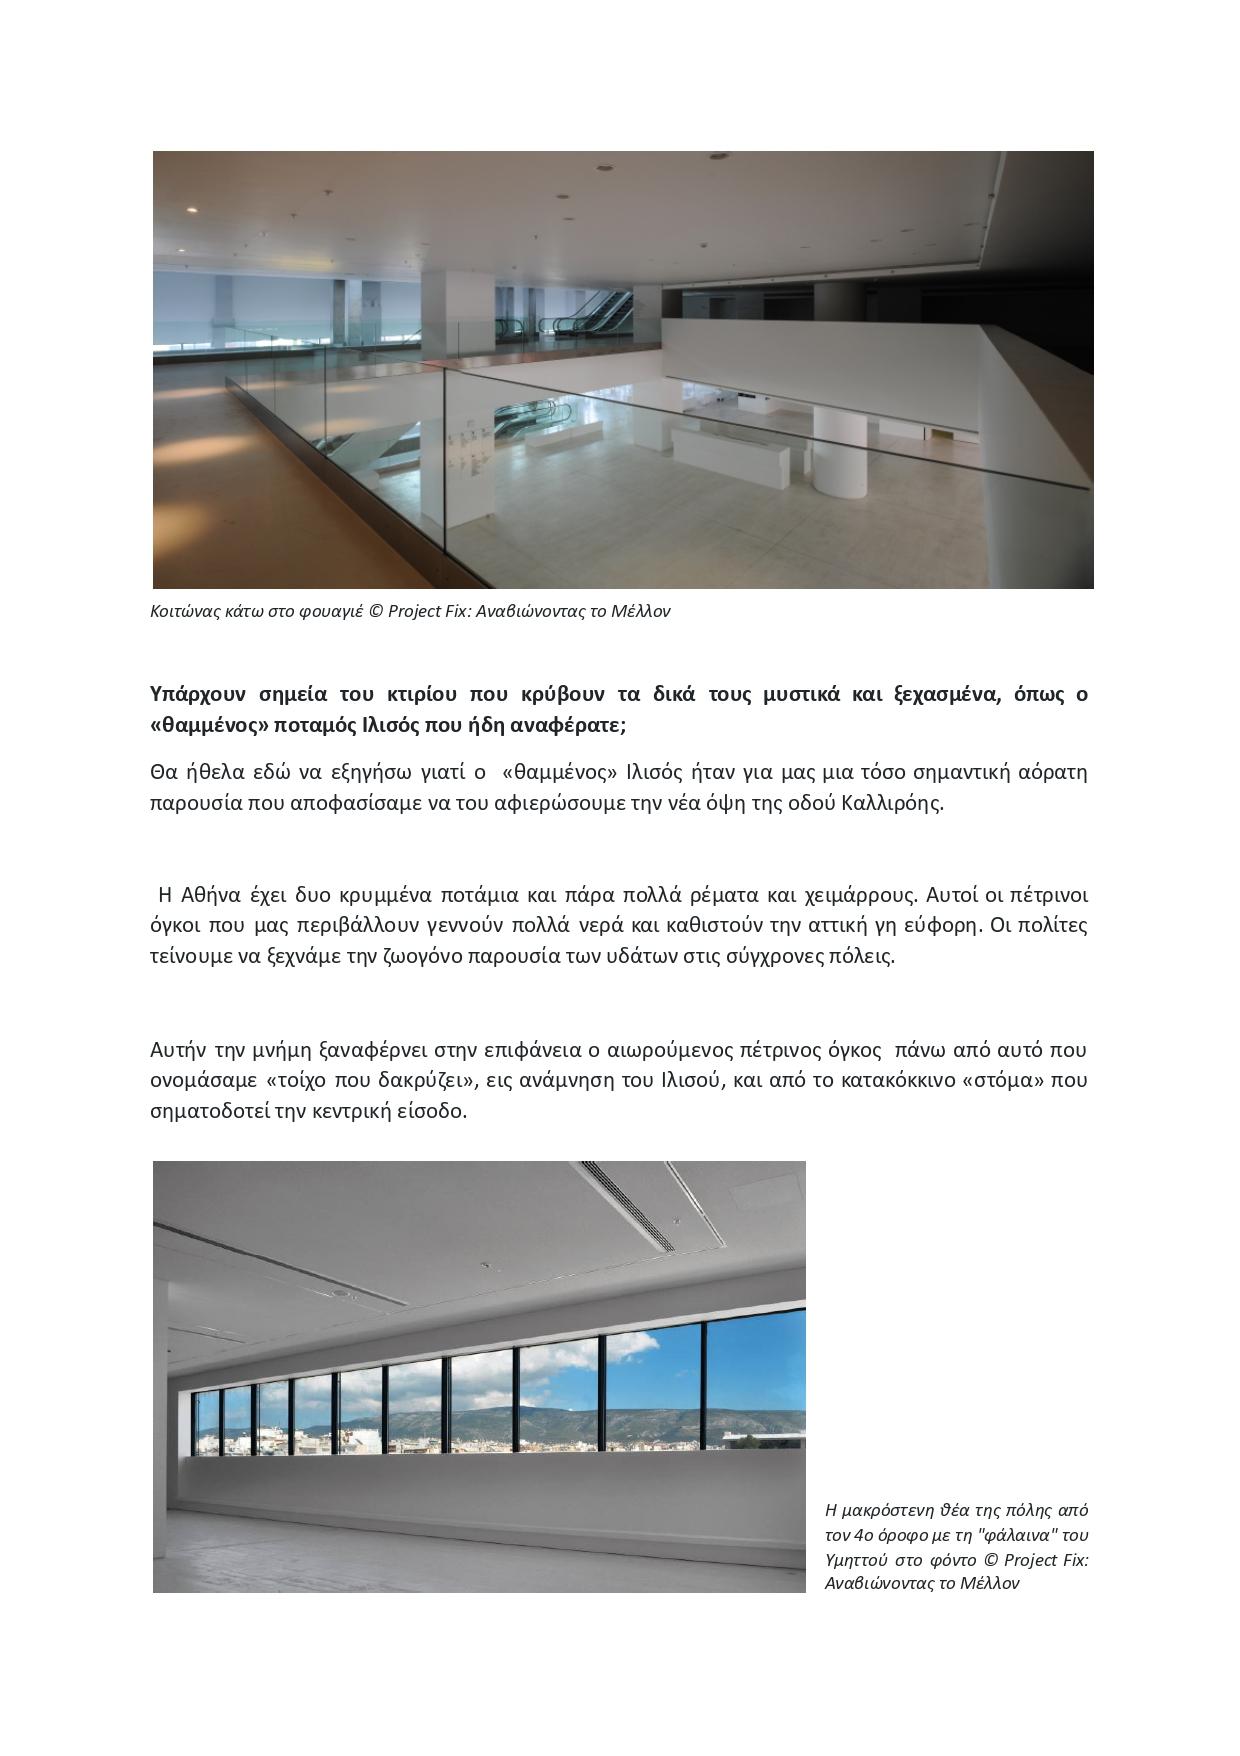 AthensVoice Kalliope Kontozoglou.docx - Google Docs_page-0006